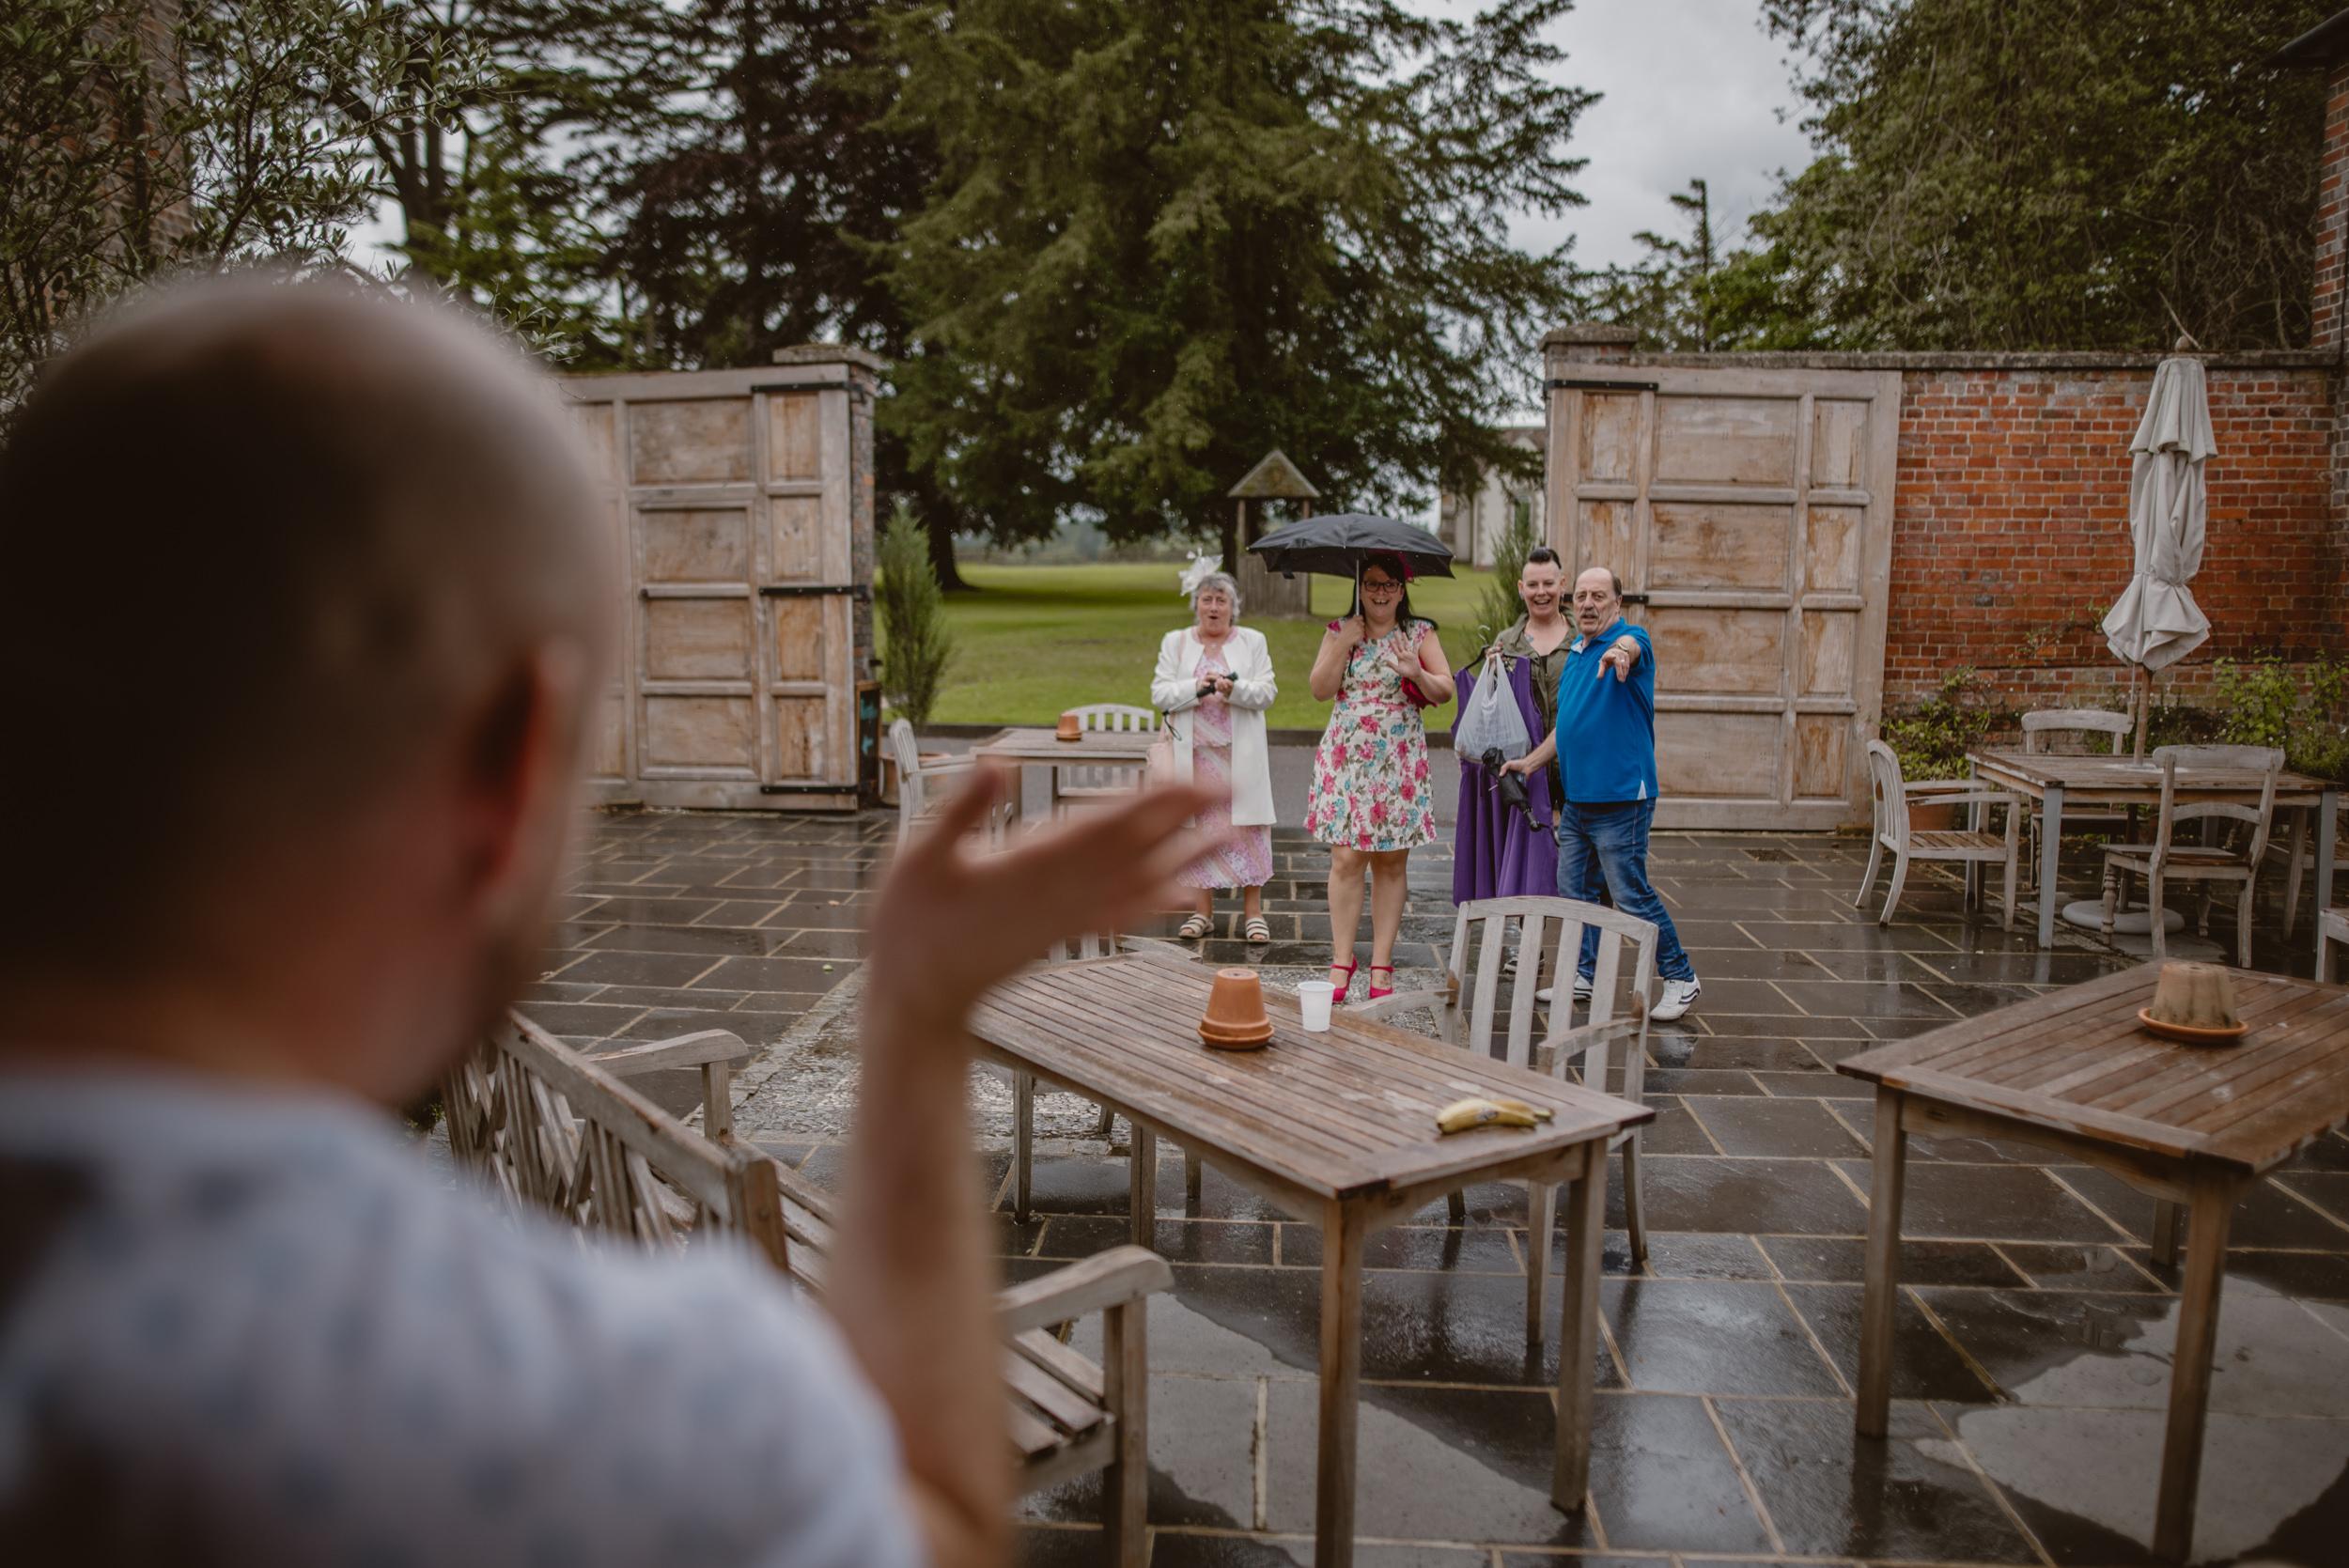 Barry-and-Chaz-wedding-Wasing-Park-Berkshire-Manu-Mendoza-Wedding-Photography-067.jpg